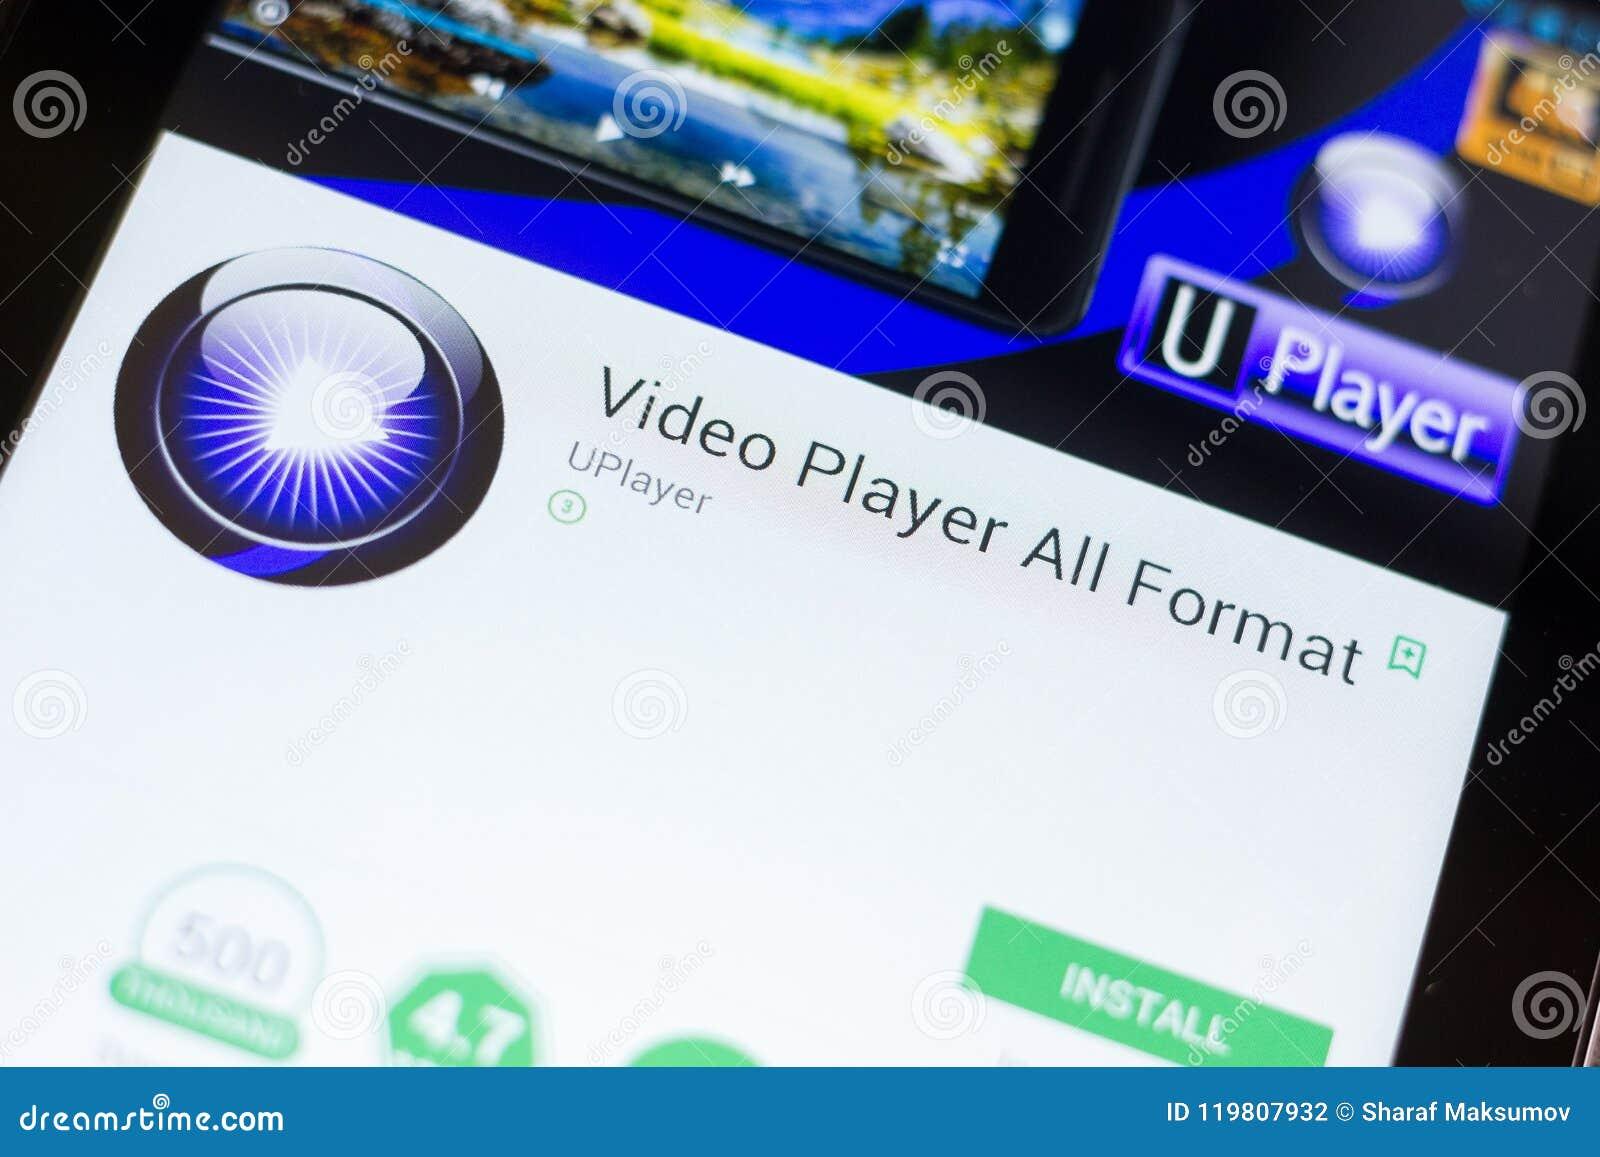 video player pc app